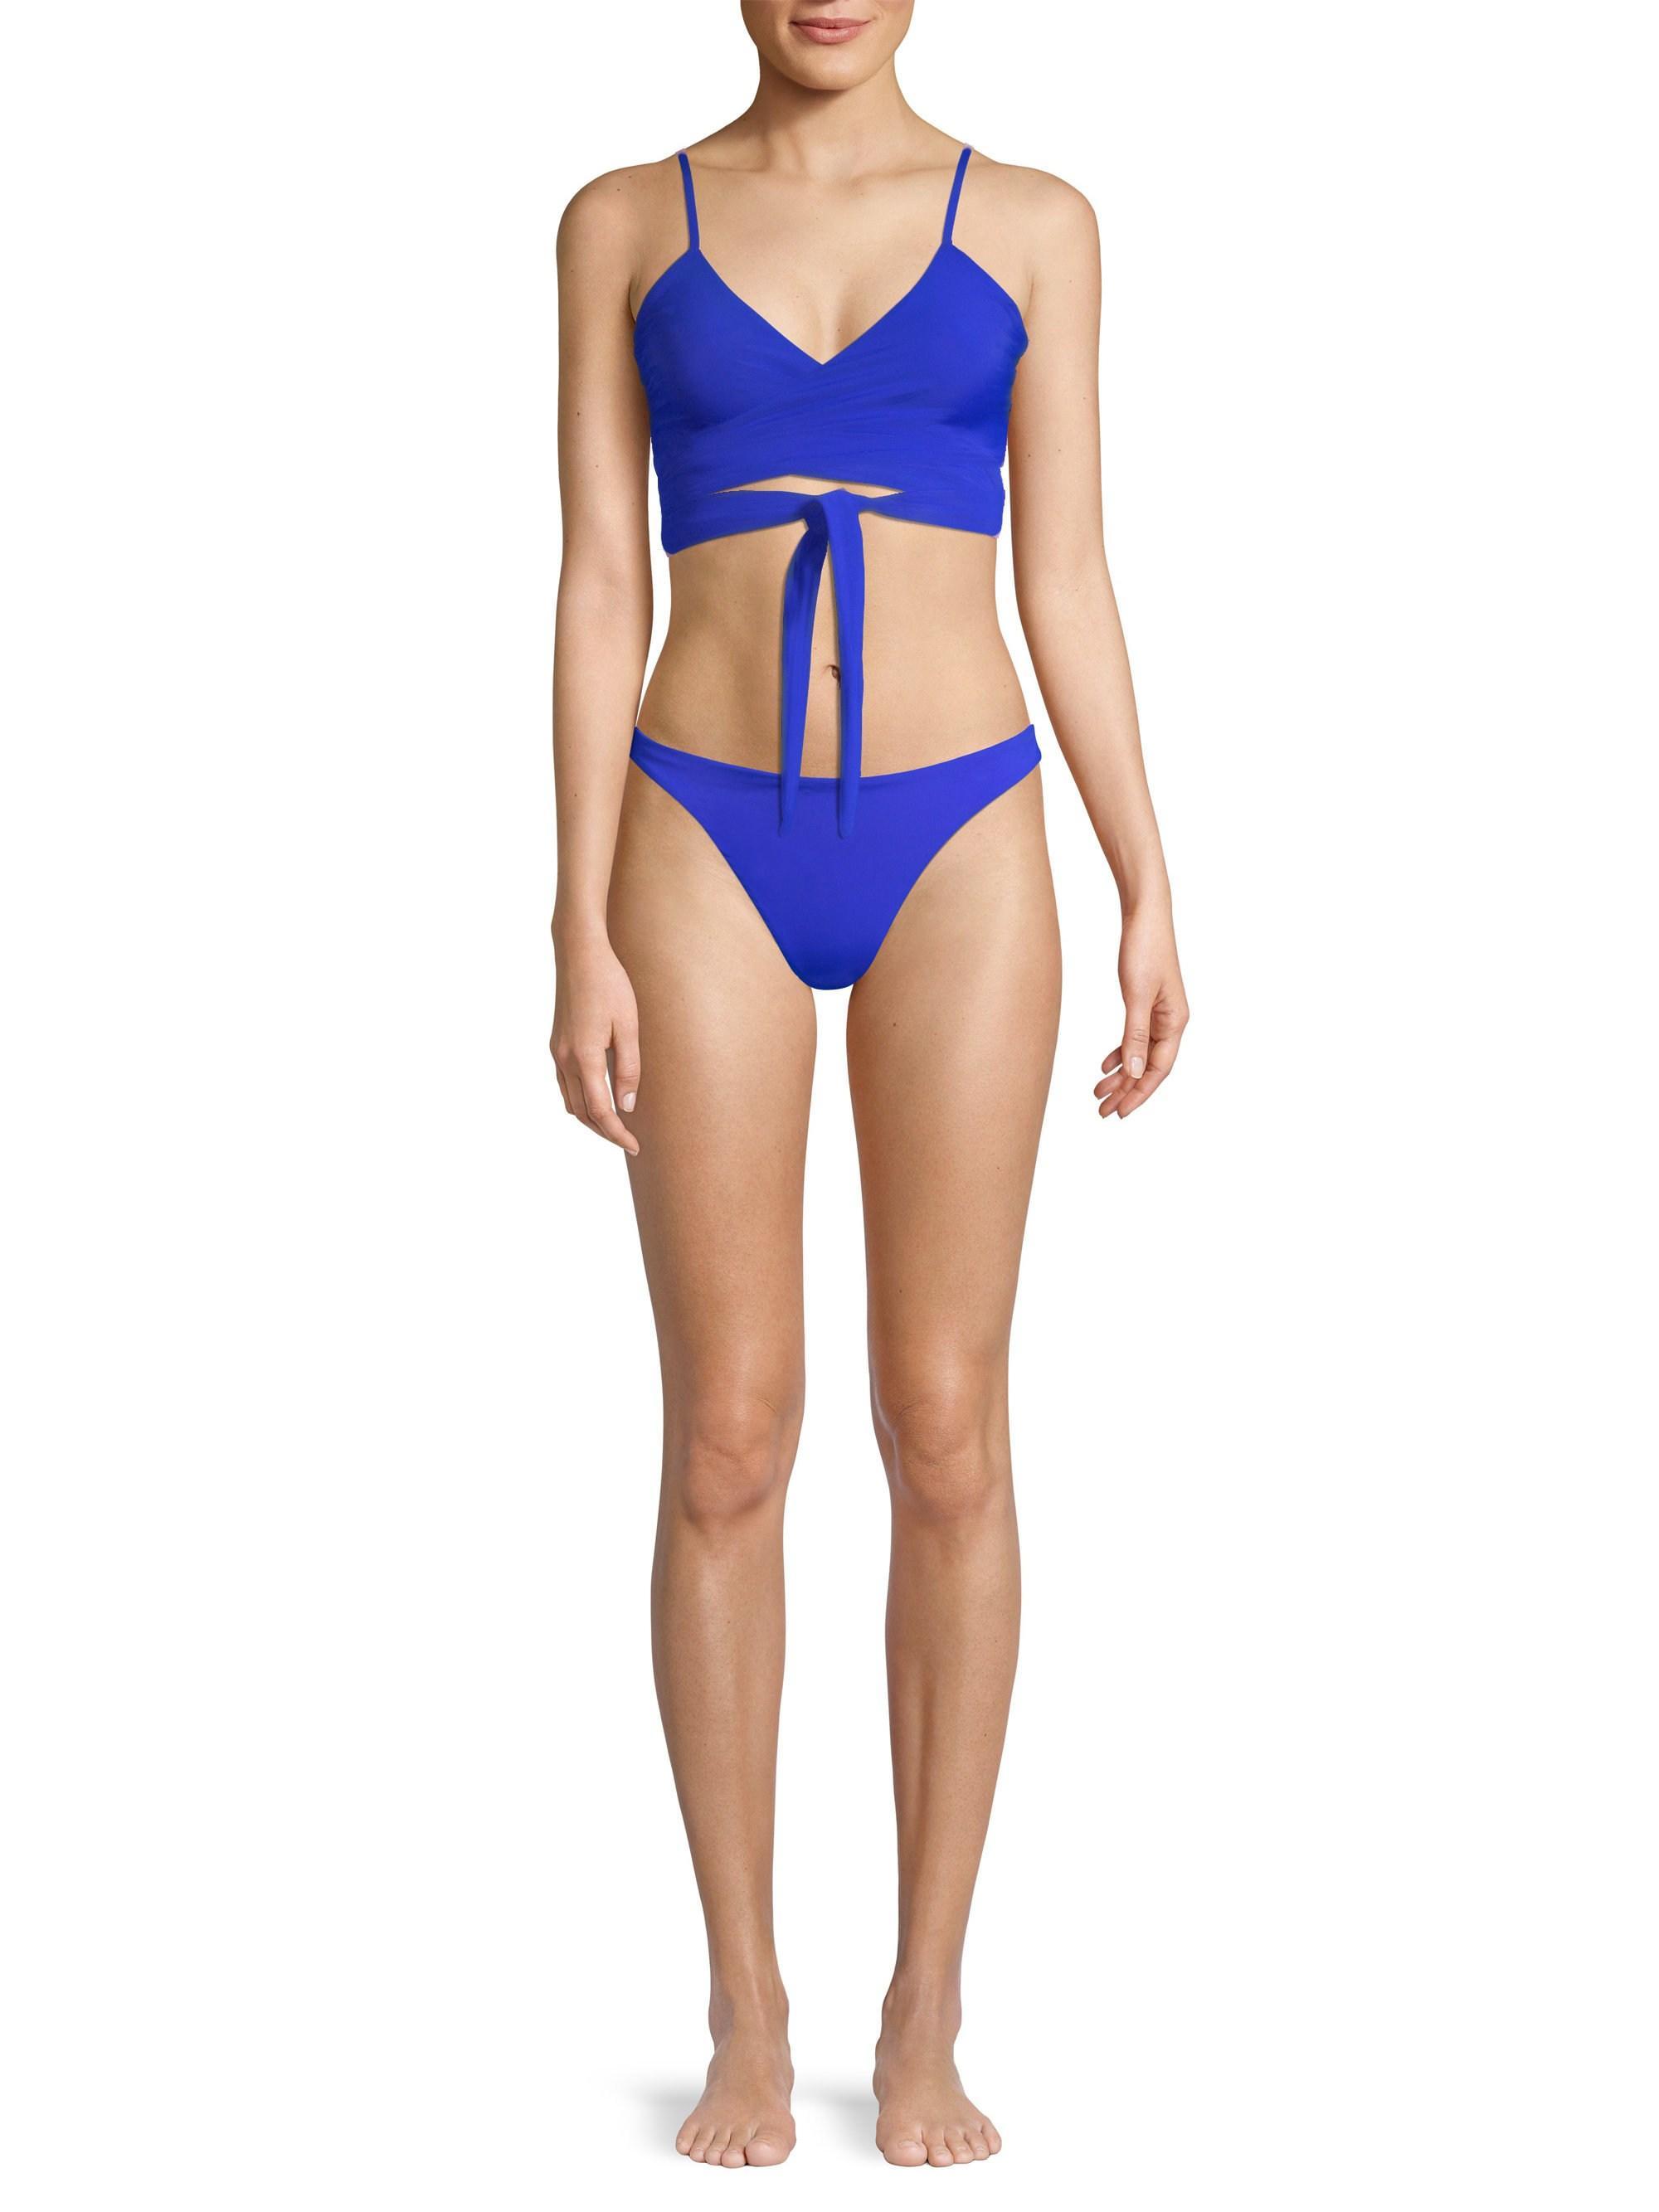 43c20a7001 Mara Hoffman Women s Mila Bikini Top - Baltimora - Size Xs in Blue ...